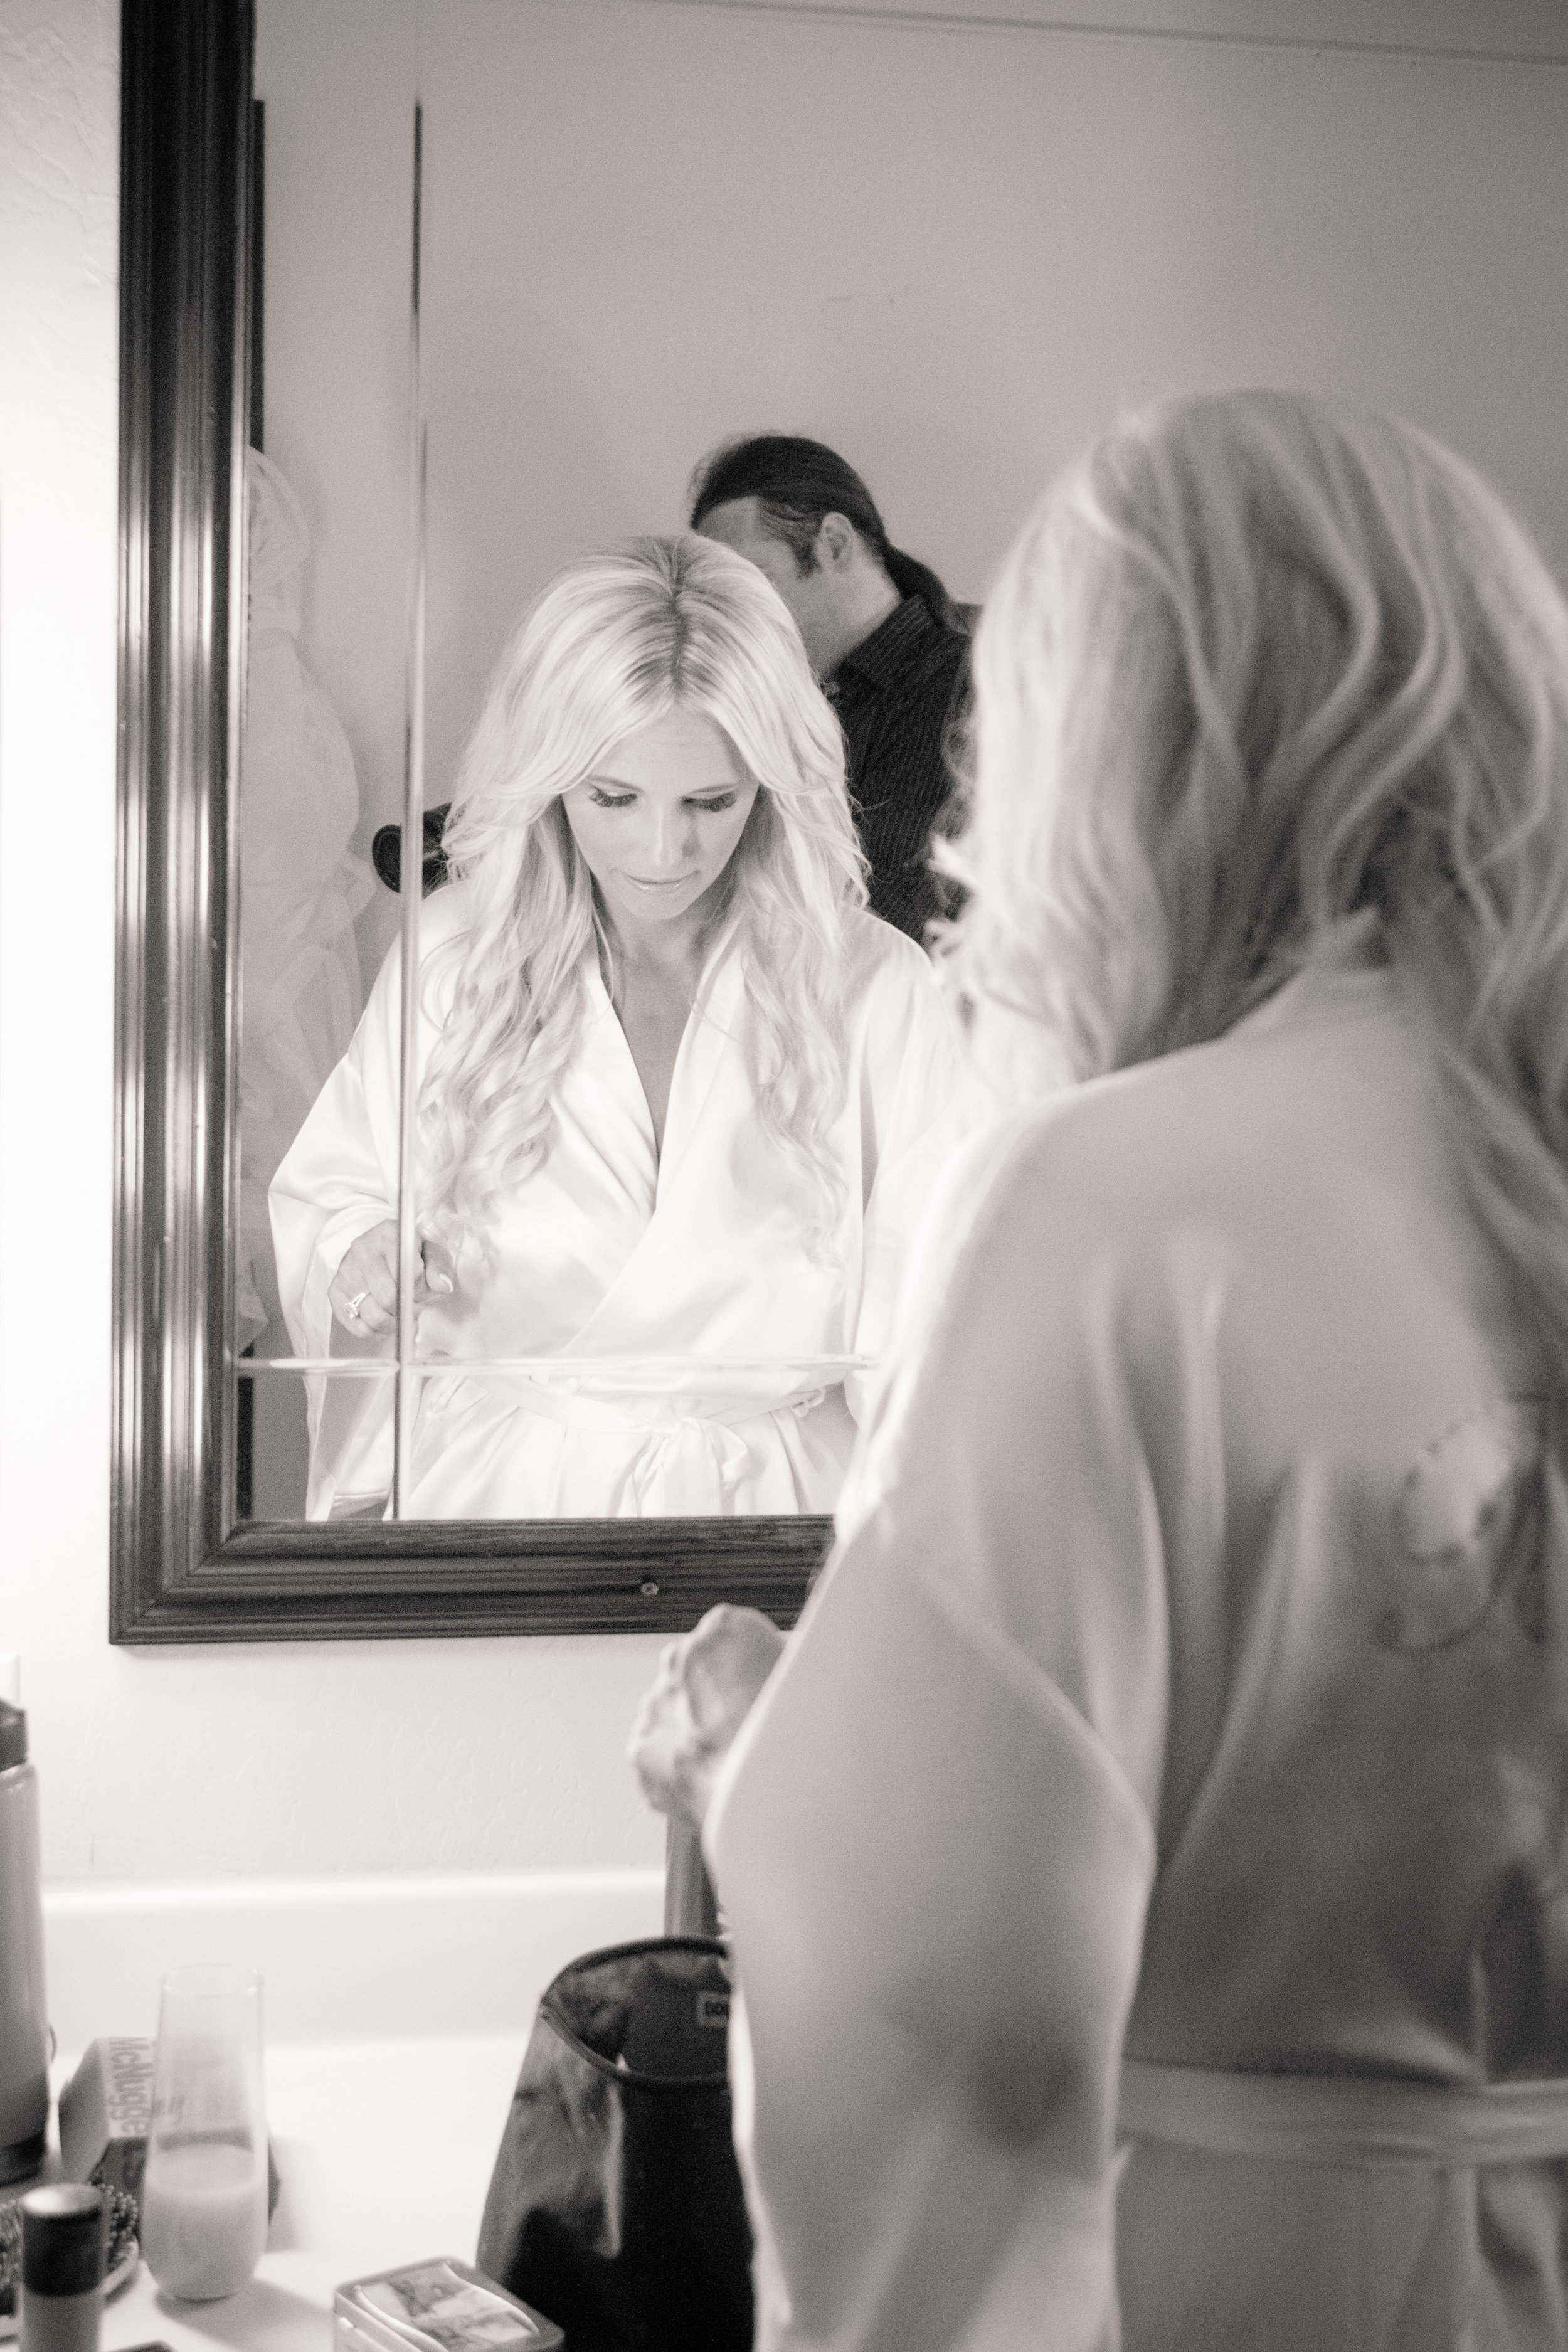 White Ranch Events - Chico - Ashley Teasley Photography - Sacramento Wedding Photographer 4.JPG